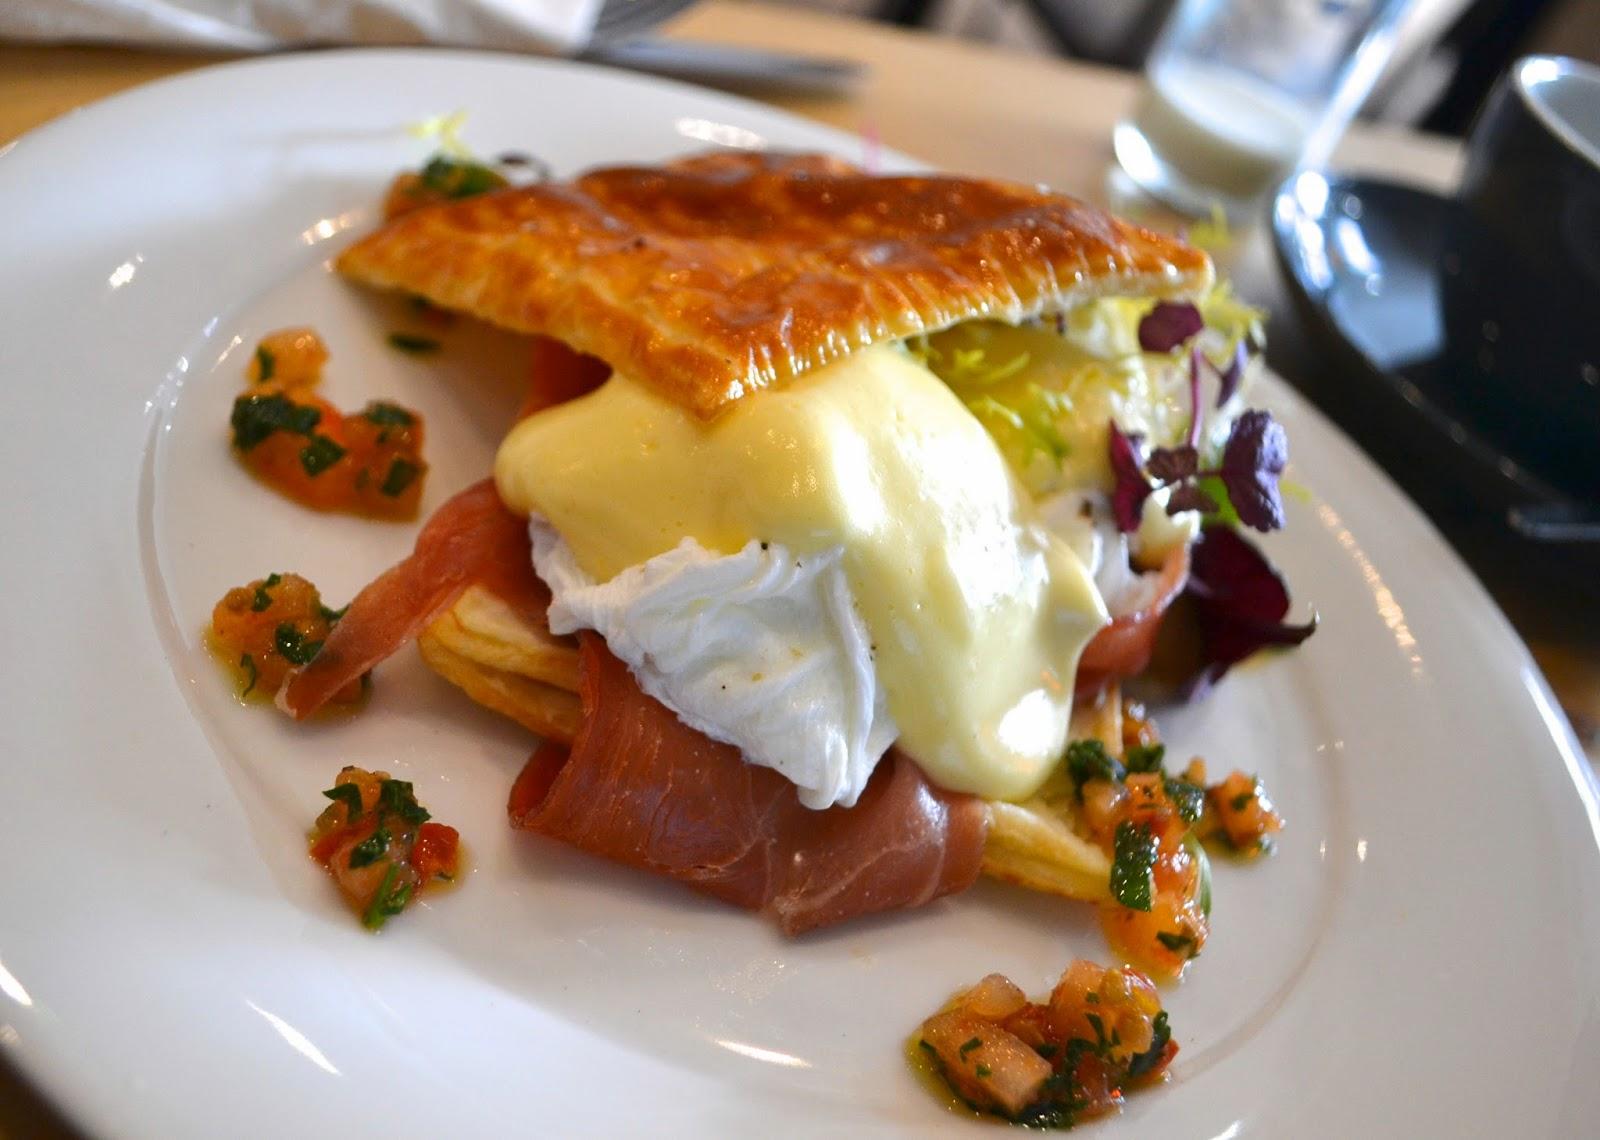 Tart Brunch London New Treat Eggs Benedict Yum